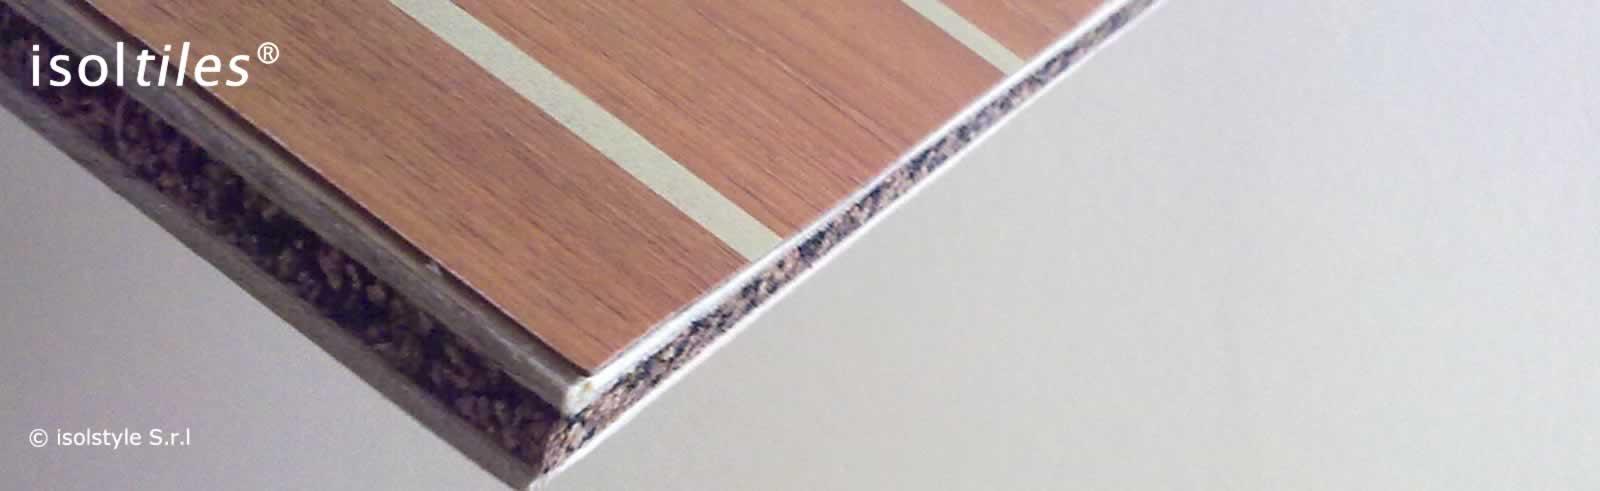 B15 piastrelle isoltiles in sugherogomma laminato finitura teak - Piastrelle in laminato ...